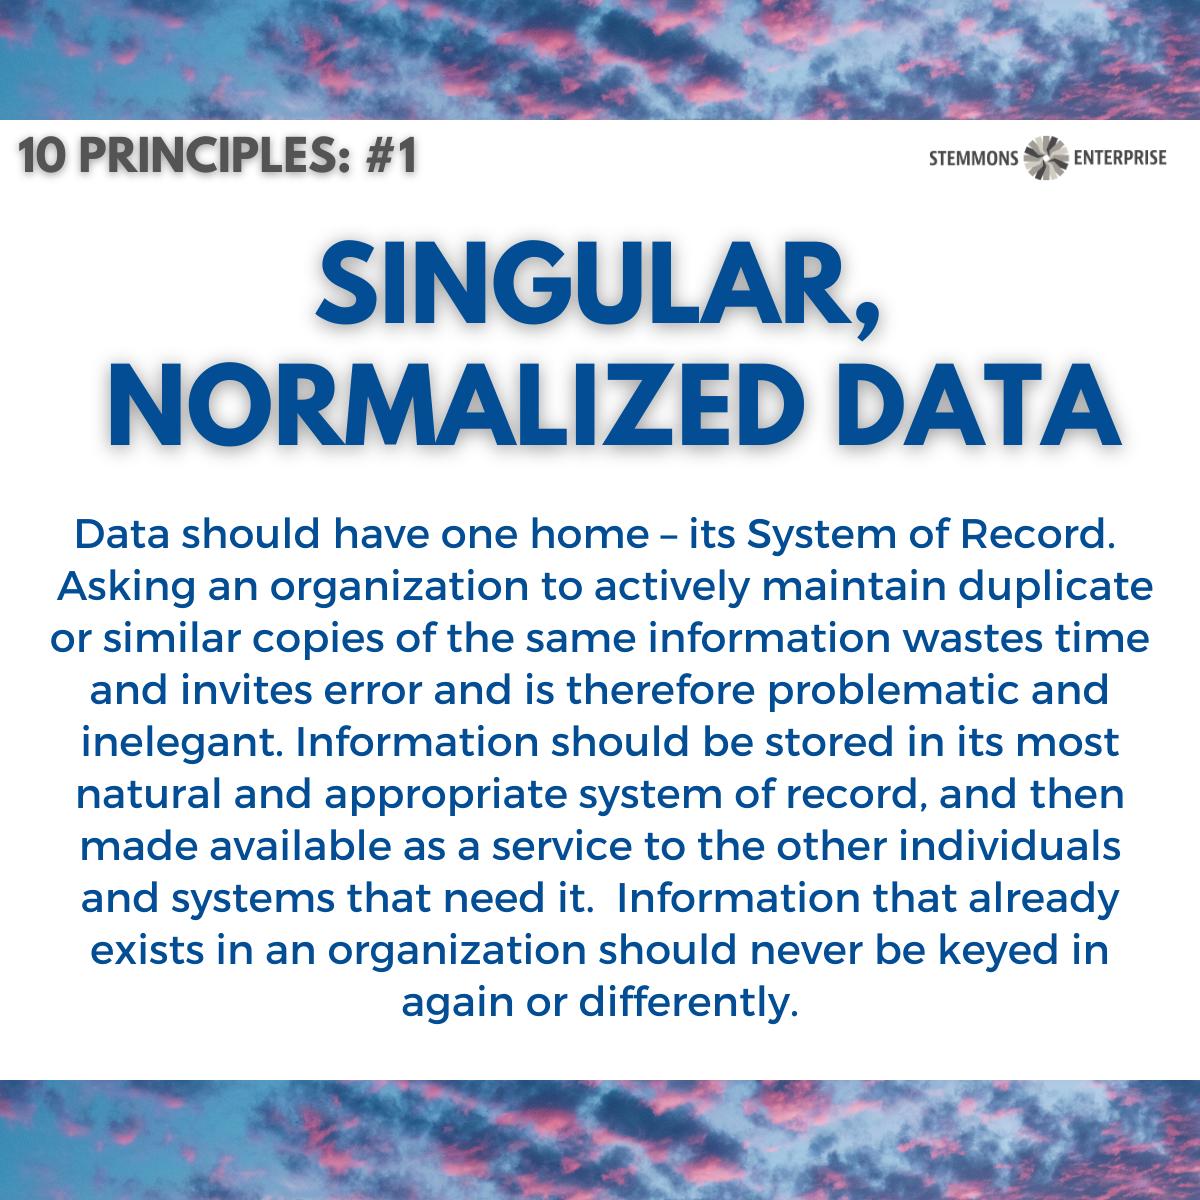 Singular, Normalized Data